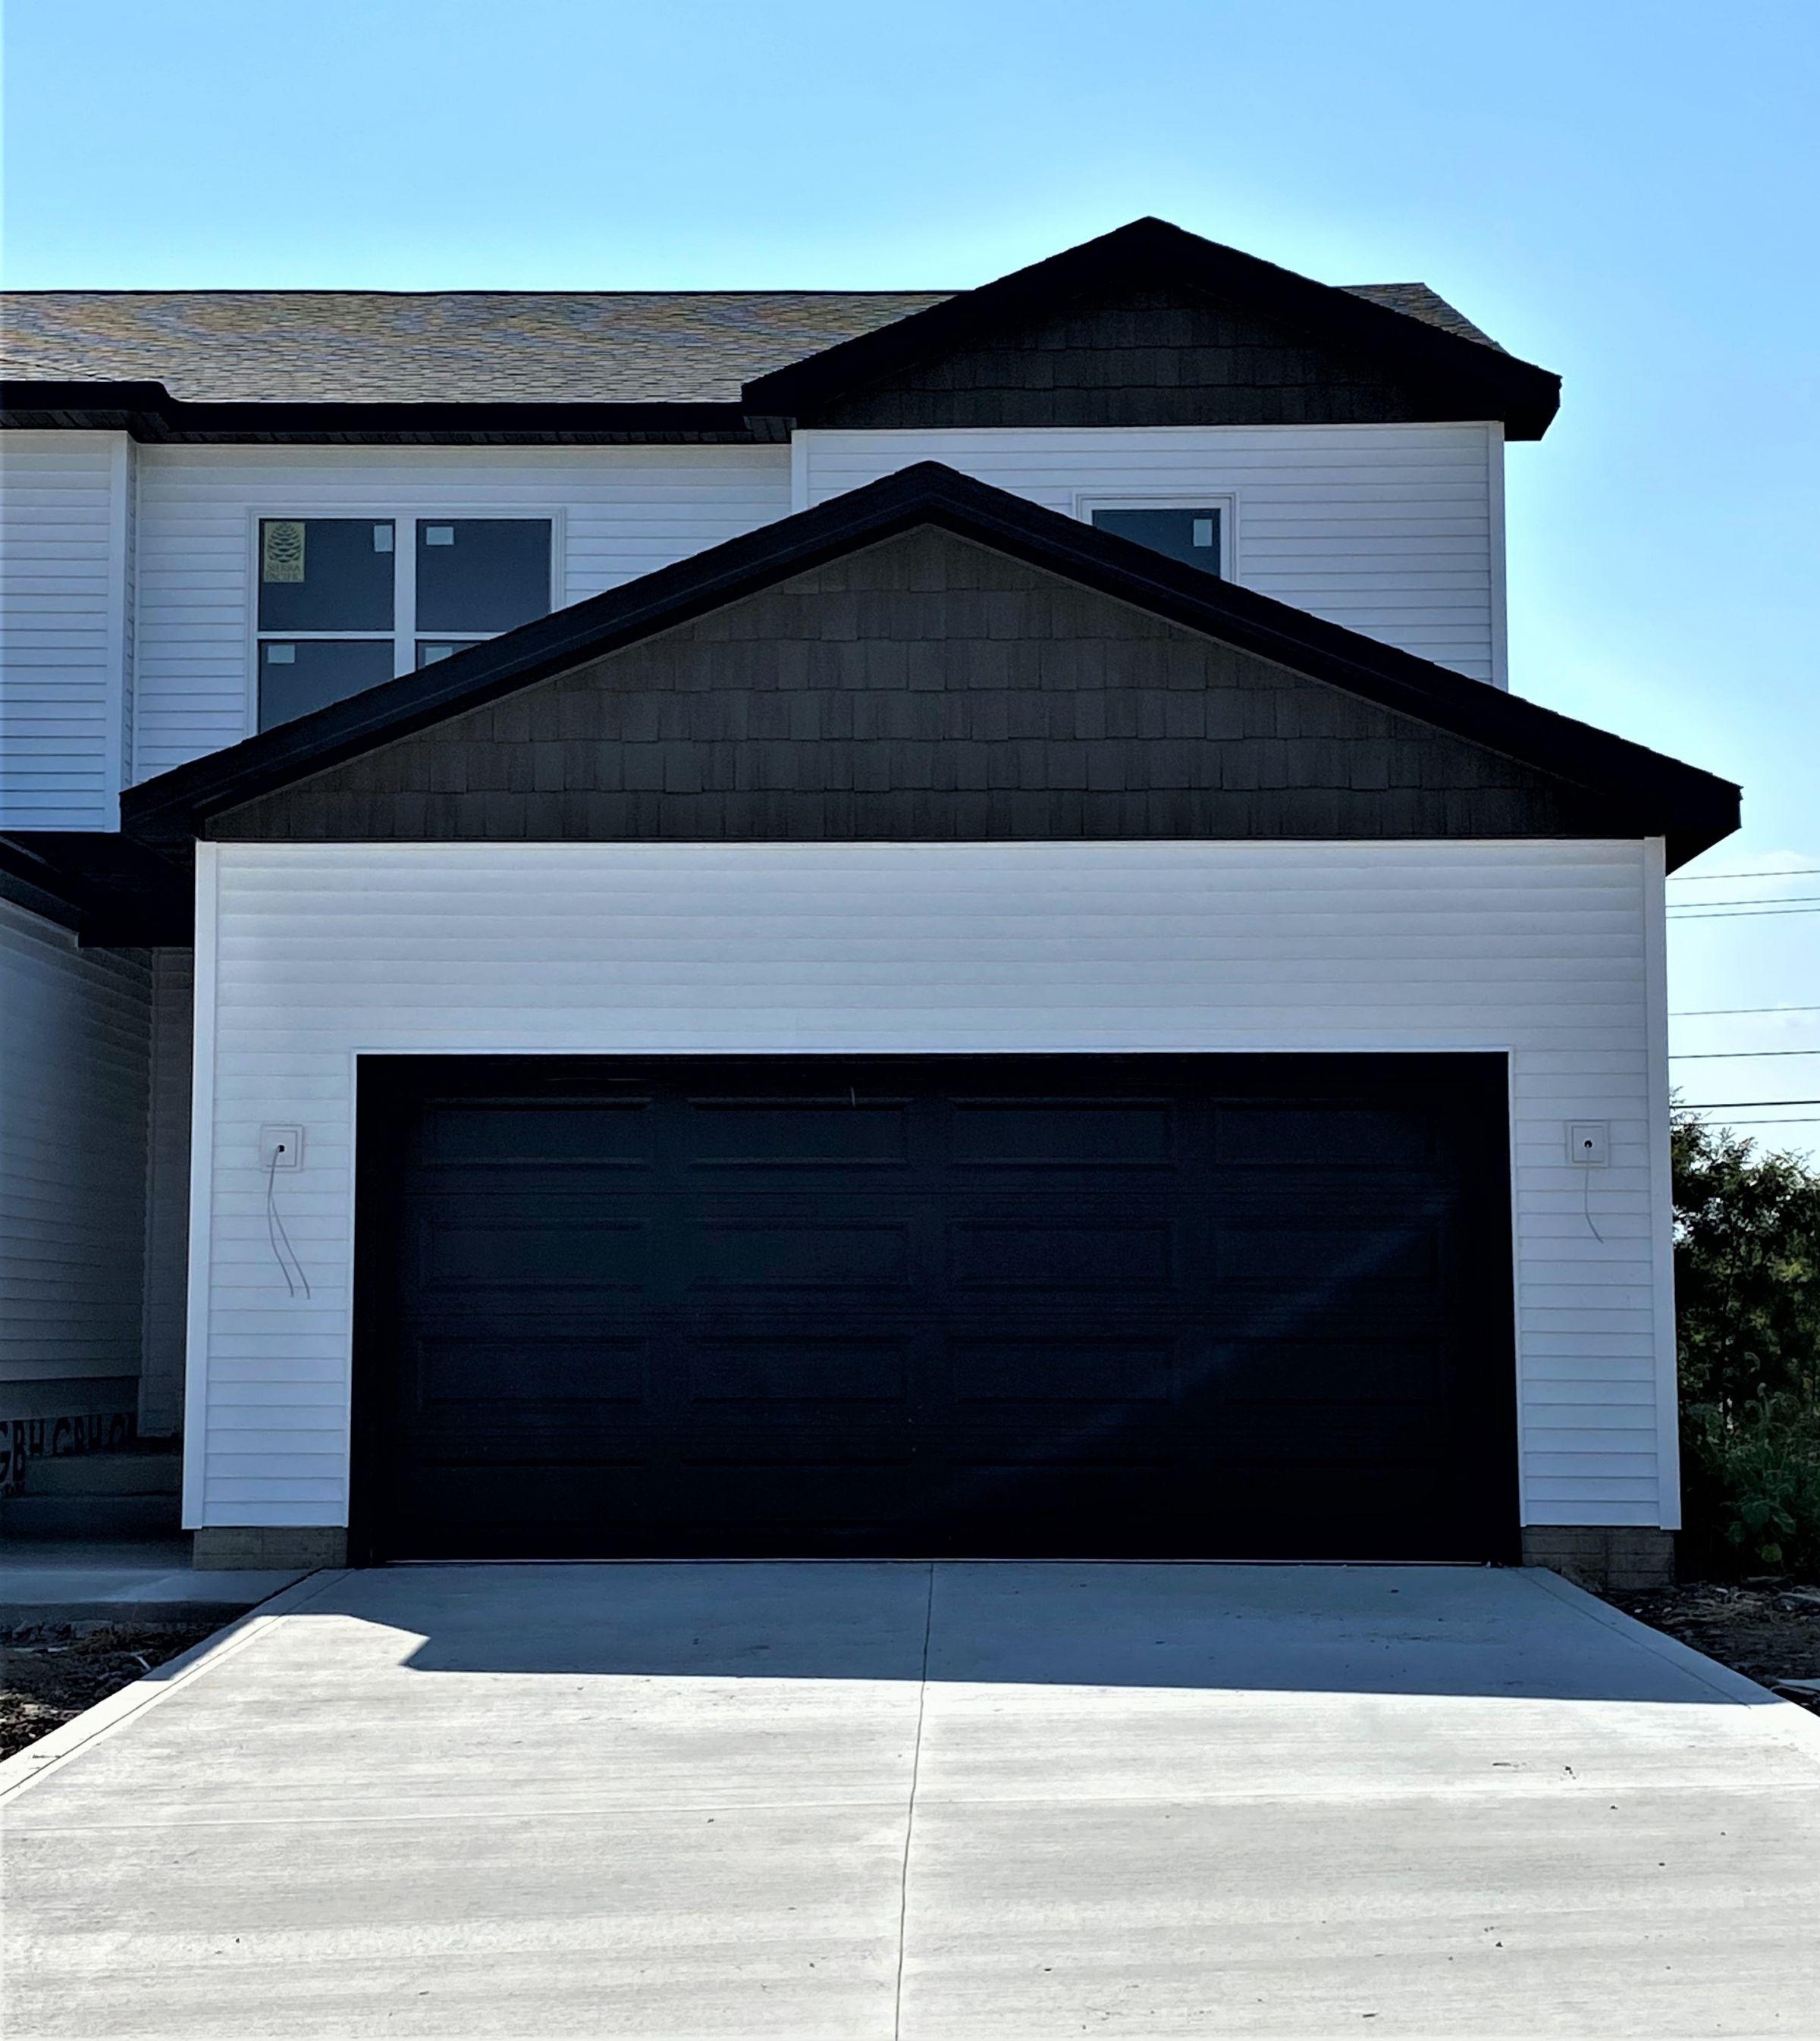 residential-warren-county-iowa-0-acres-listing-number-15134-0-2020-08-26-185448.jpg